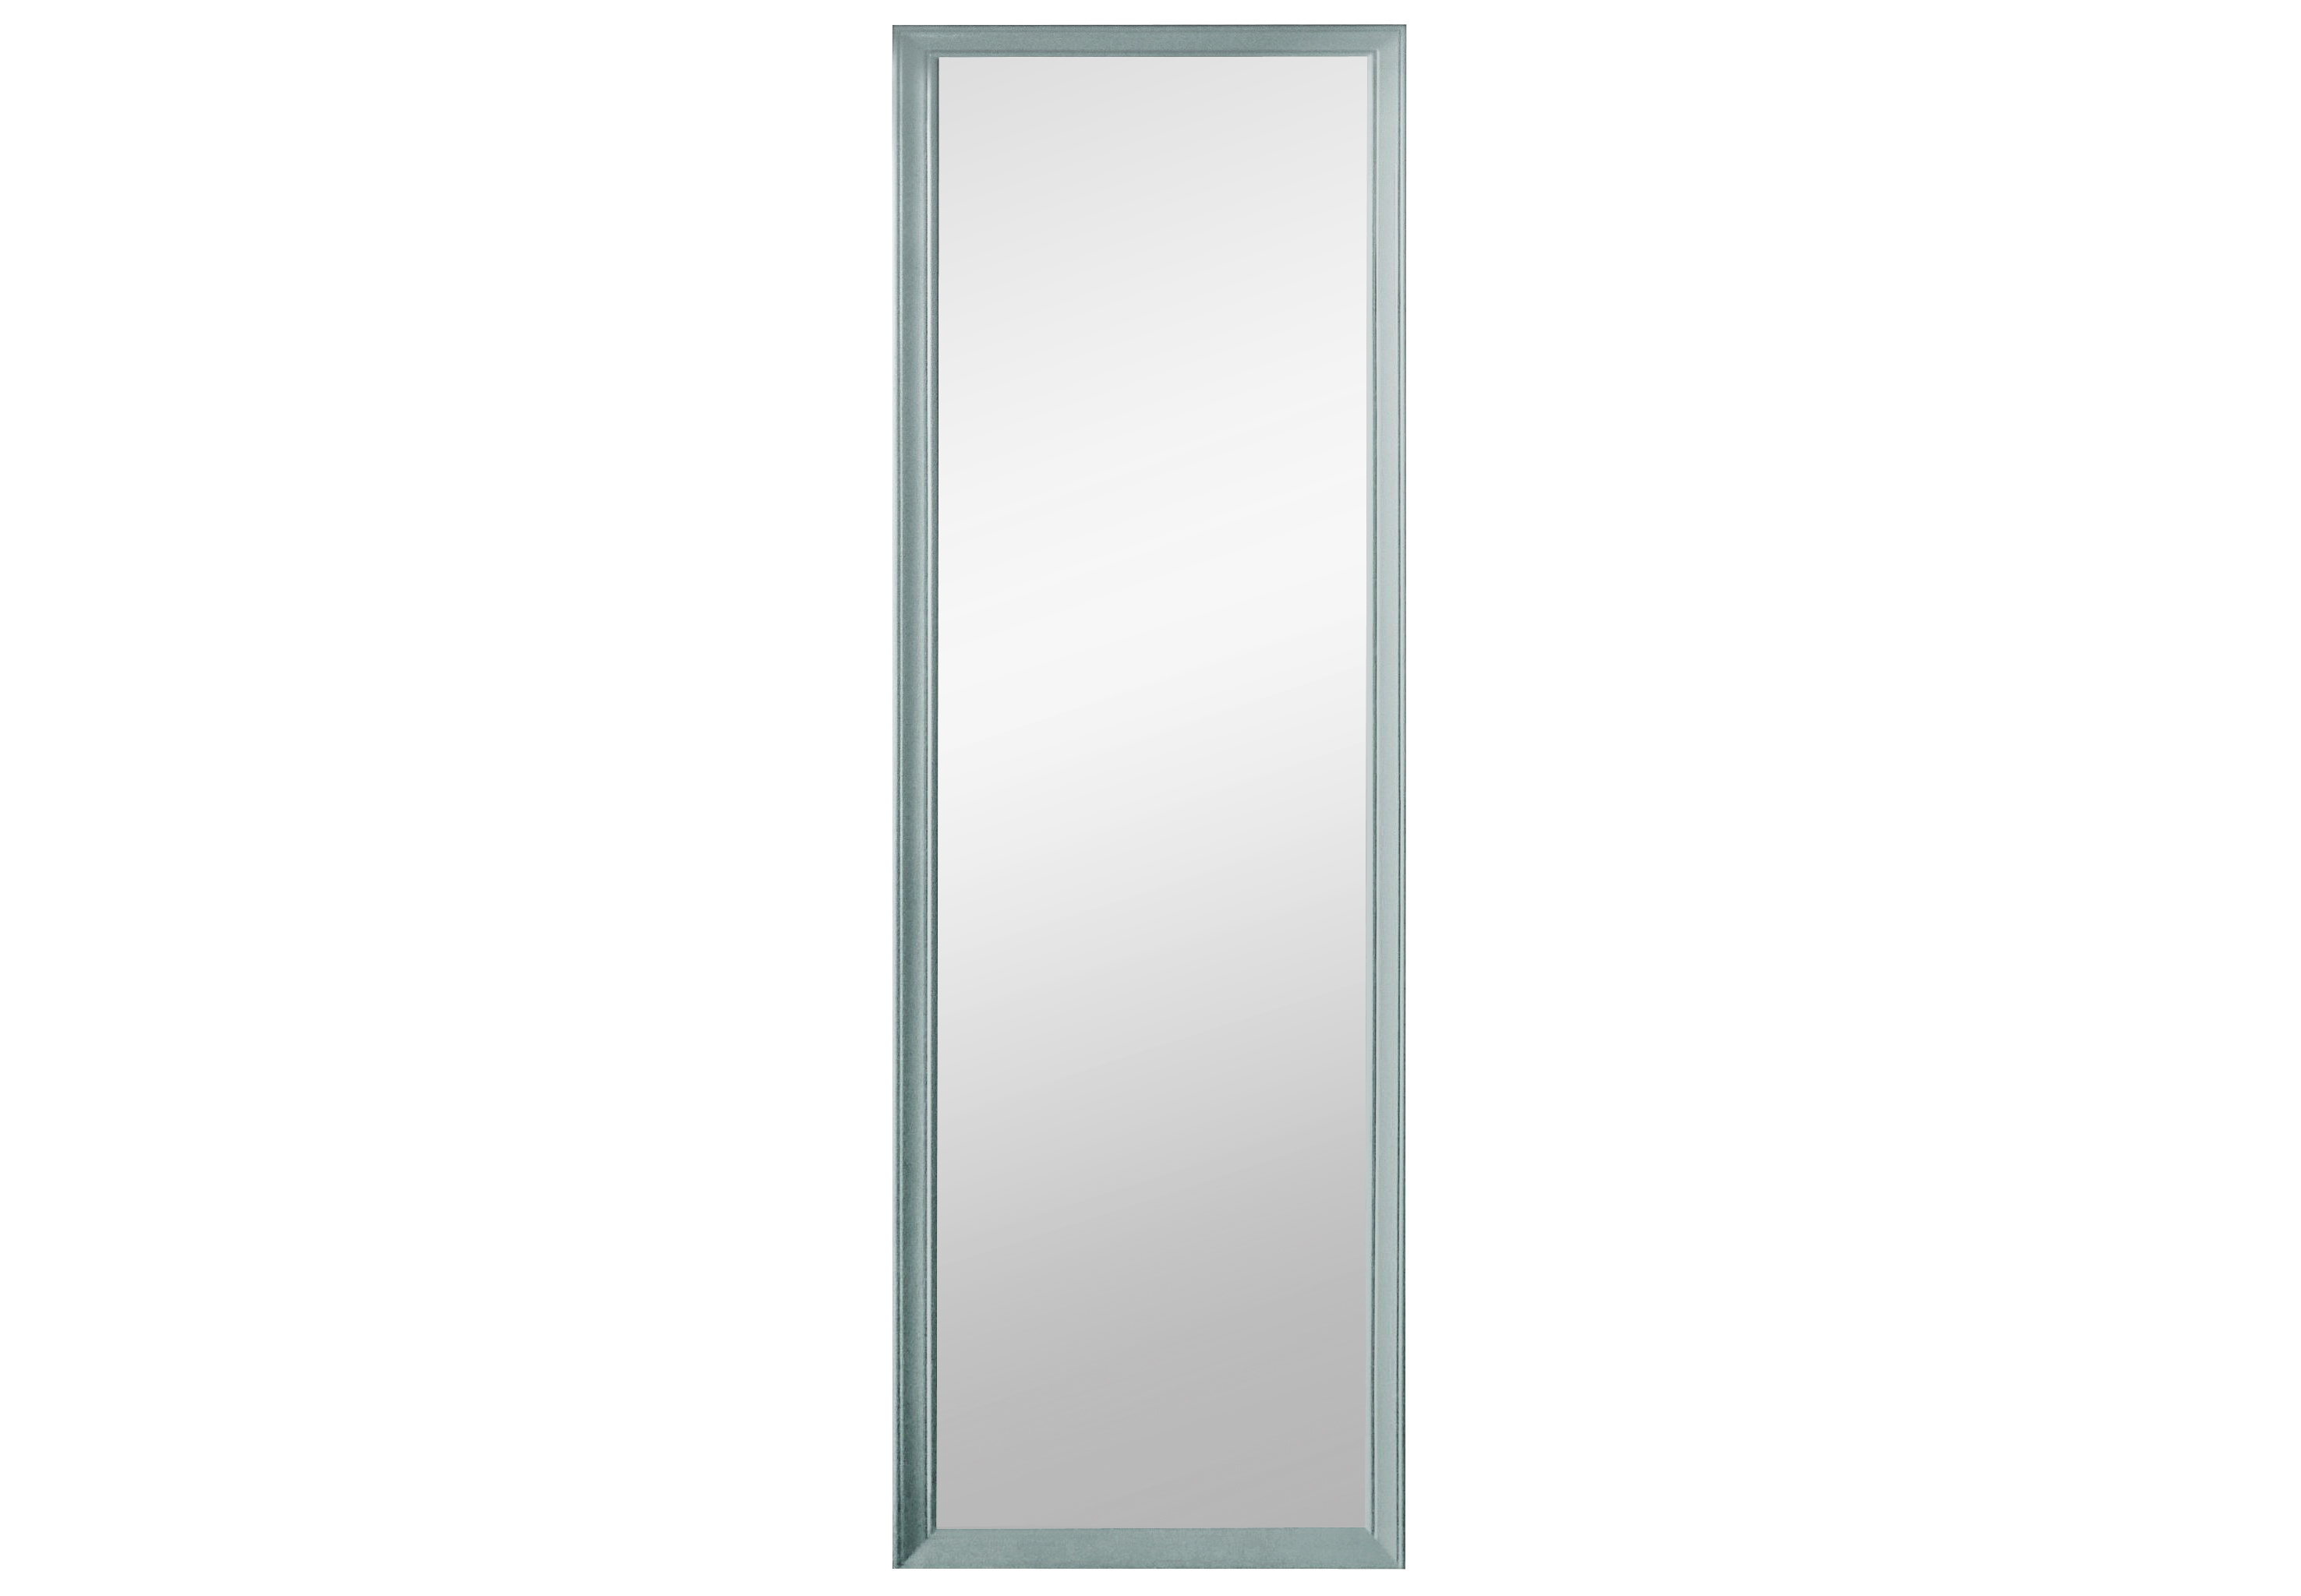 Зеркало настенное VenzaНастенные зеркала<br><br><br>Material: Пластик<br>Ширина см: 35.0<br>Высота см: 125.0<br>Глубина см: 2.0